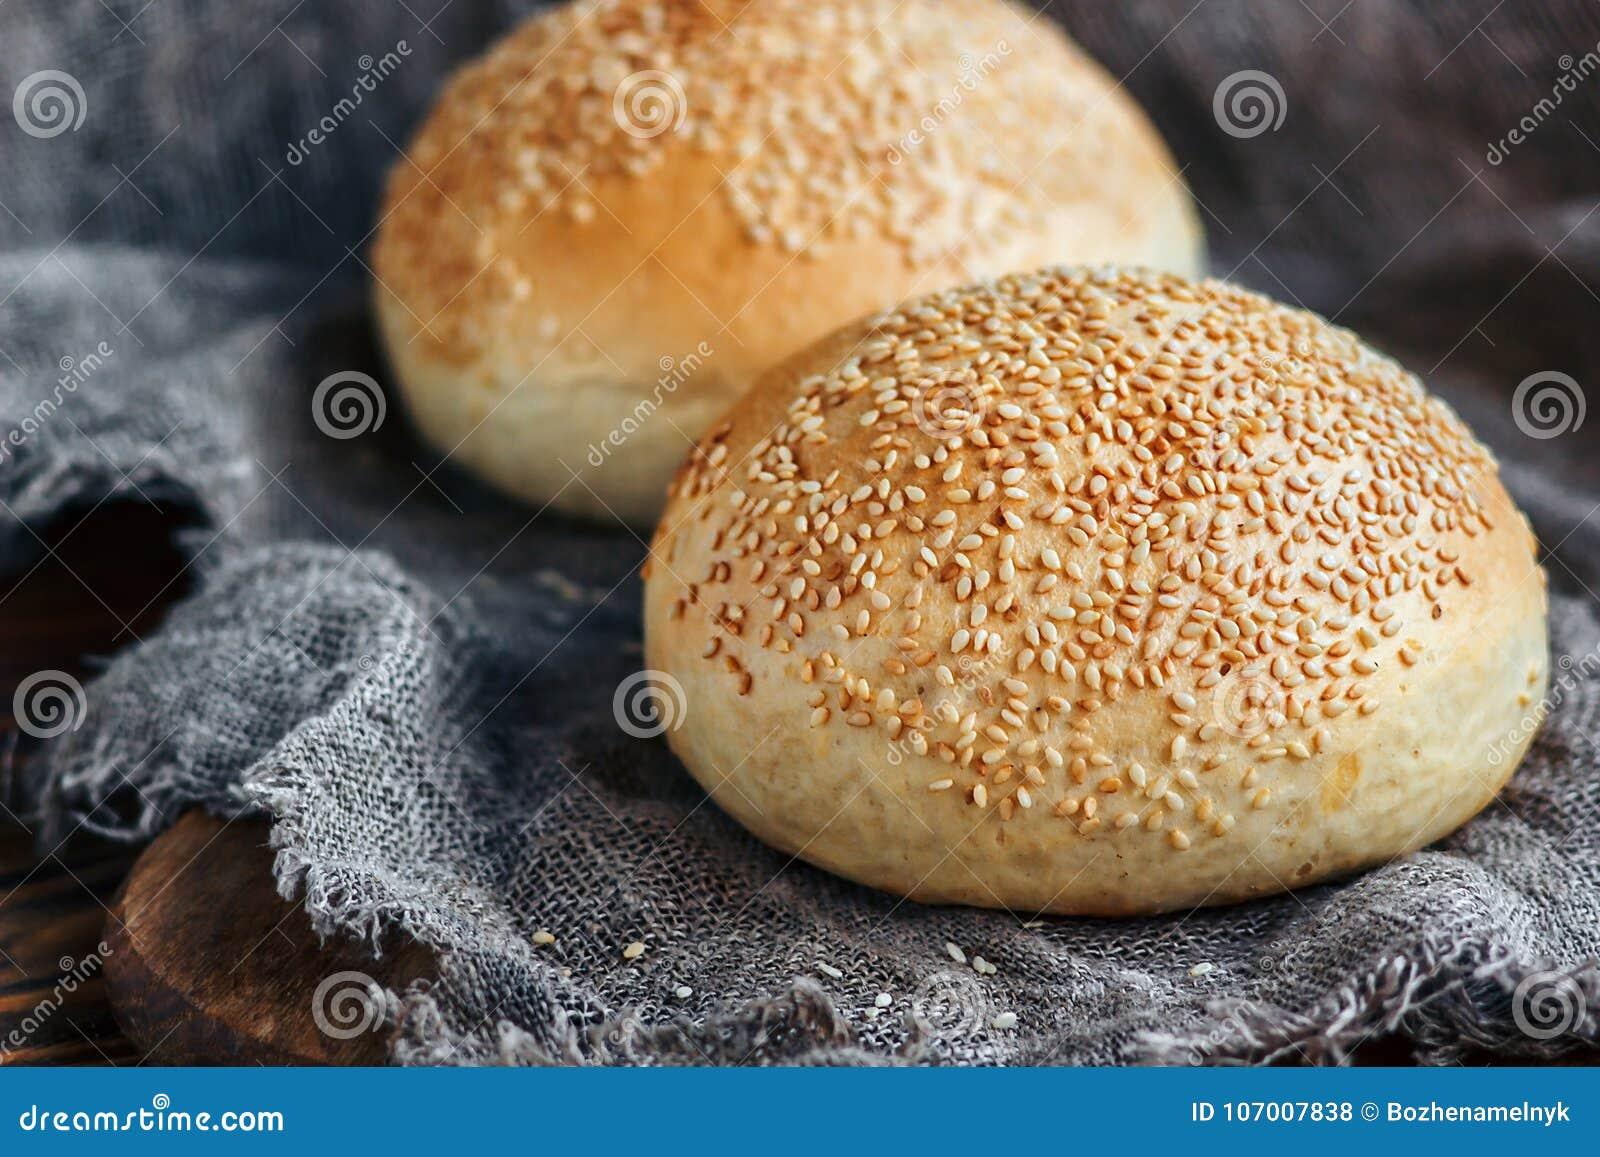 Round bun, sesame bun, bread rolls. Tasty burger bread with sesame on wooden, burlap background. Freshly baked hamburger buns. Top